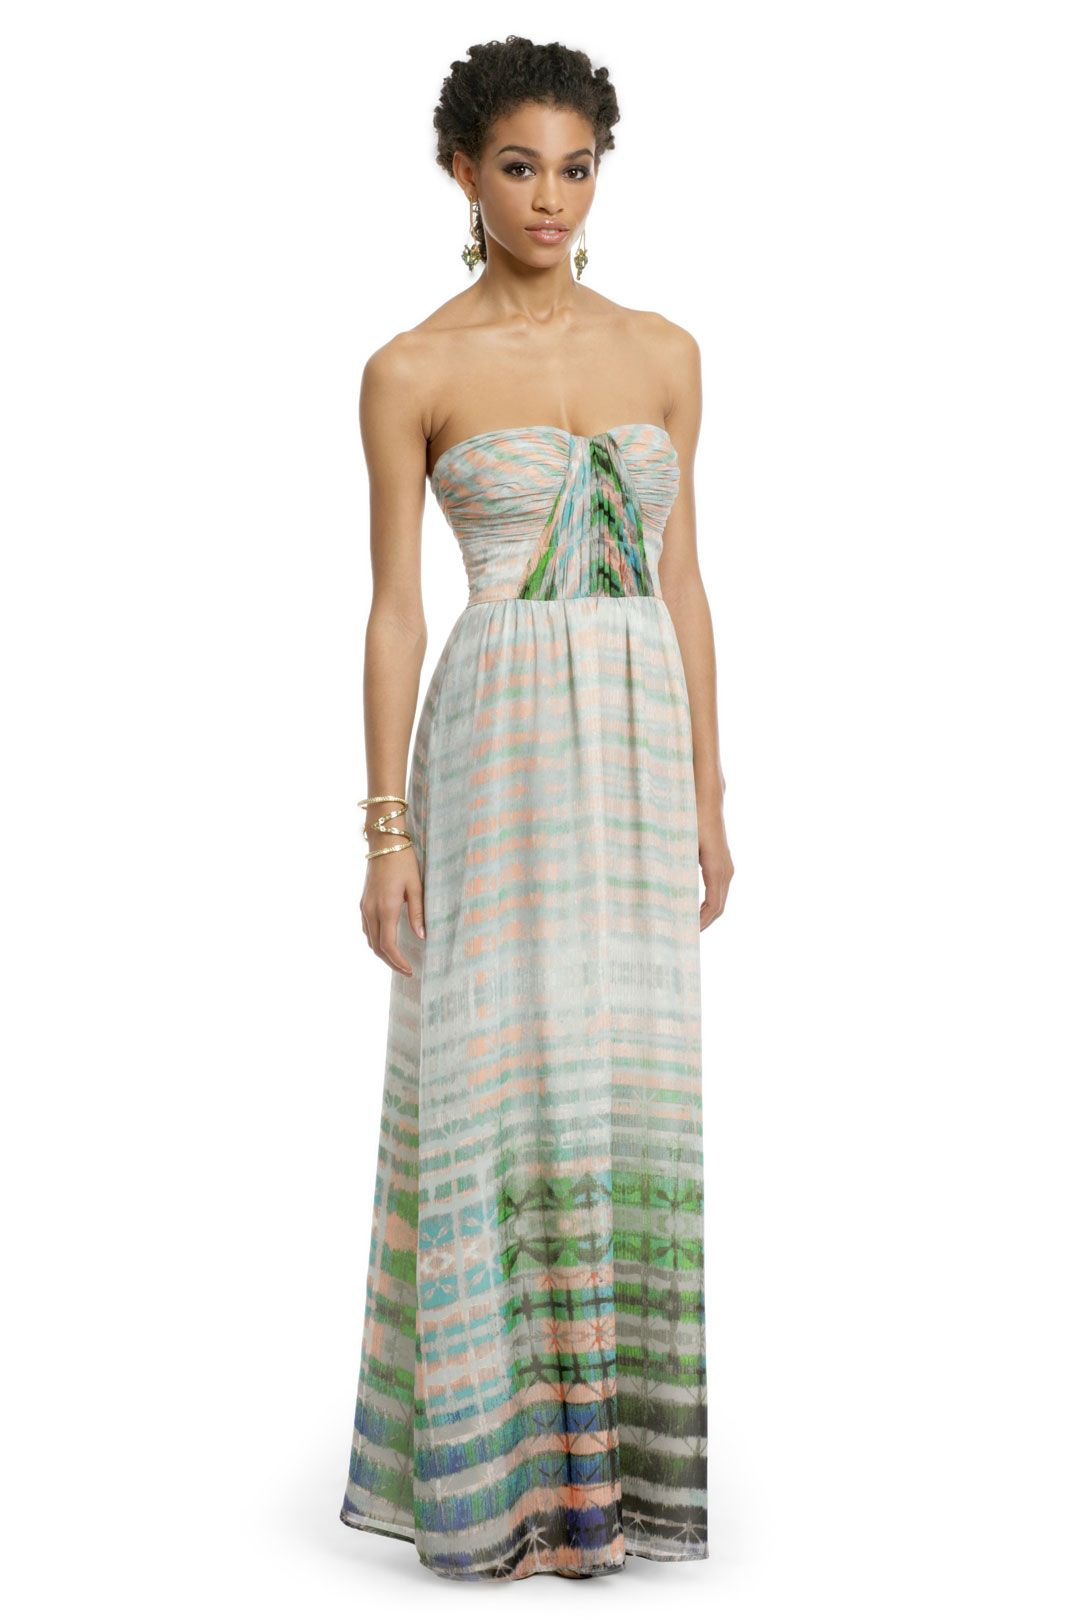 Rent wedding dresses  Twelfth Street by Cynthia Vincent Pastel Kaleidoscope Maxi  Itus